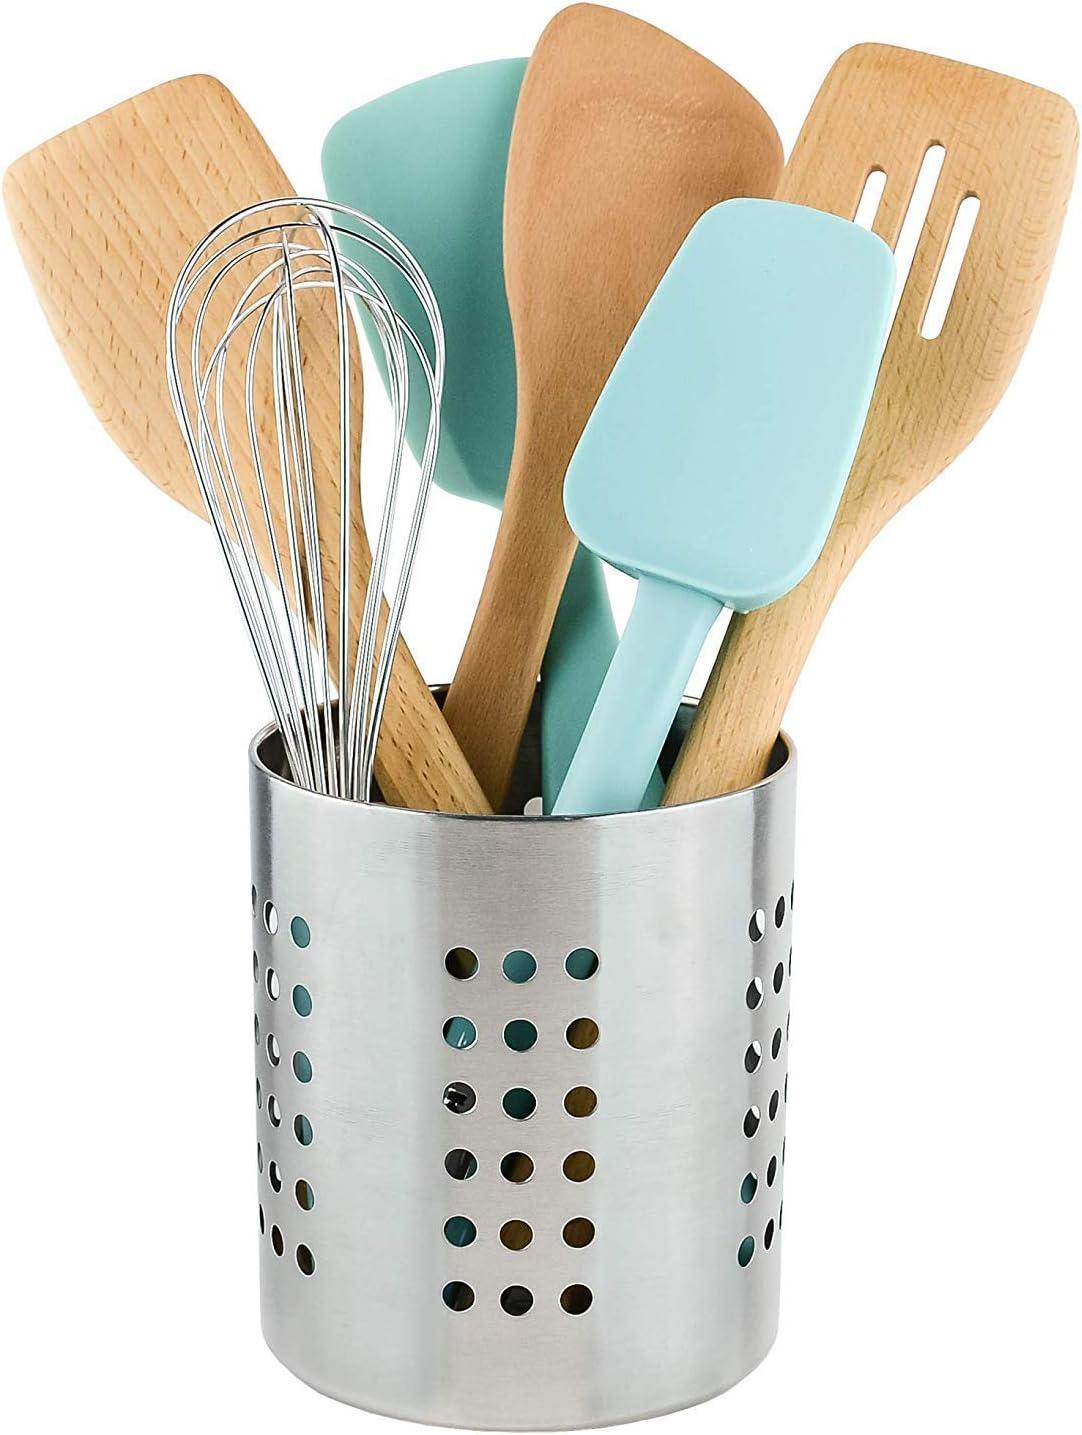 Stainless Steel Cutlery Holder Kitchen Utensil Holder Pot Kitchen Utensil Caddy Cooking Tools Holder